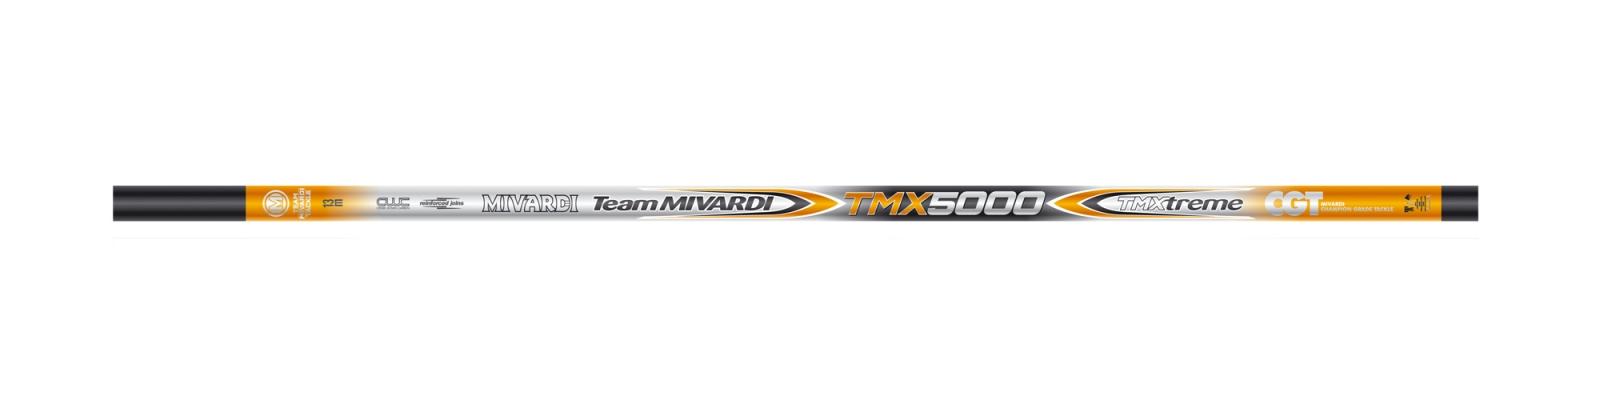 Topset na děličku Team Mivardi TMX 5000   4 díly